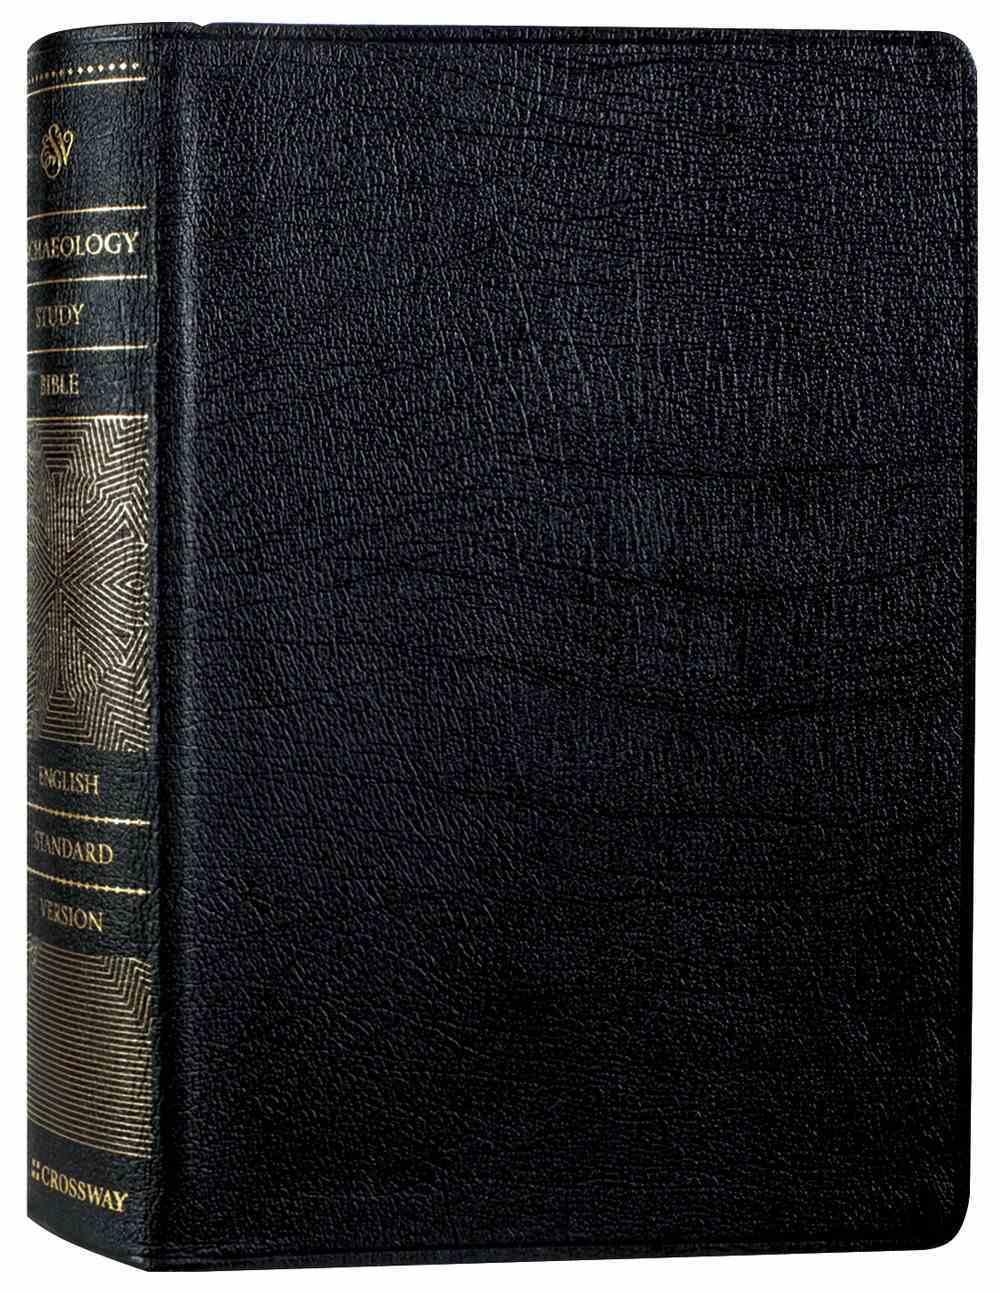 ESV Archaeology Study Bible Black (Black Letter Edition) Genuine Leather